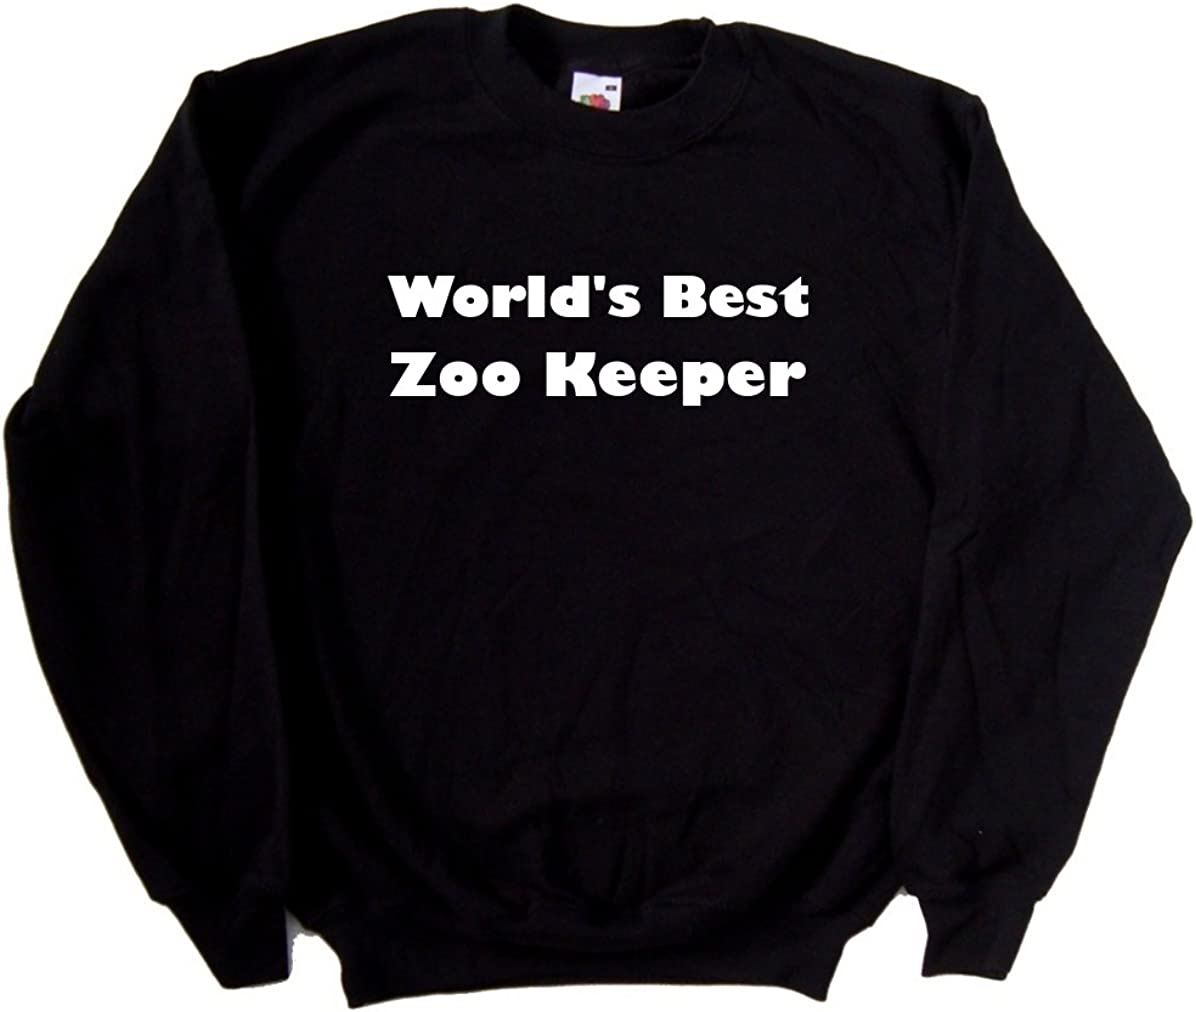 Worlds Best Zoo Keeper Black Sweatshirt